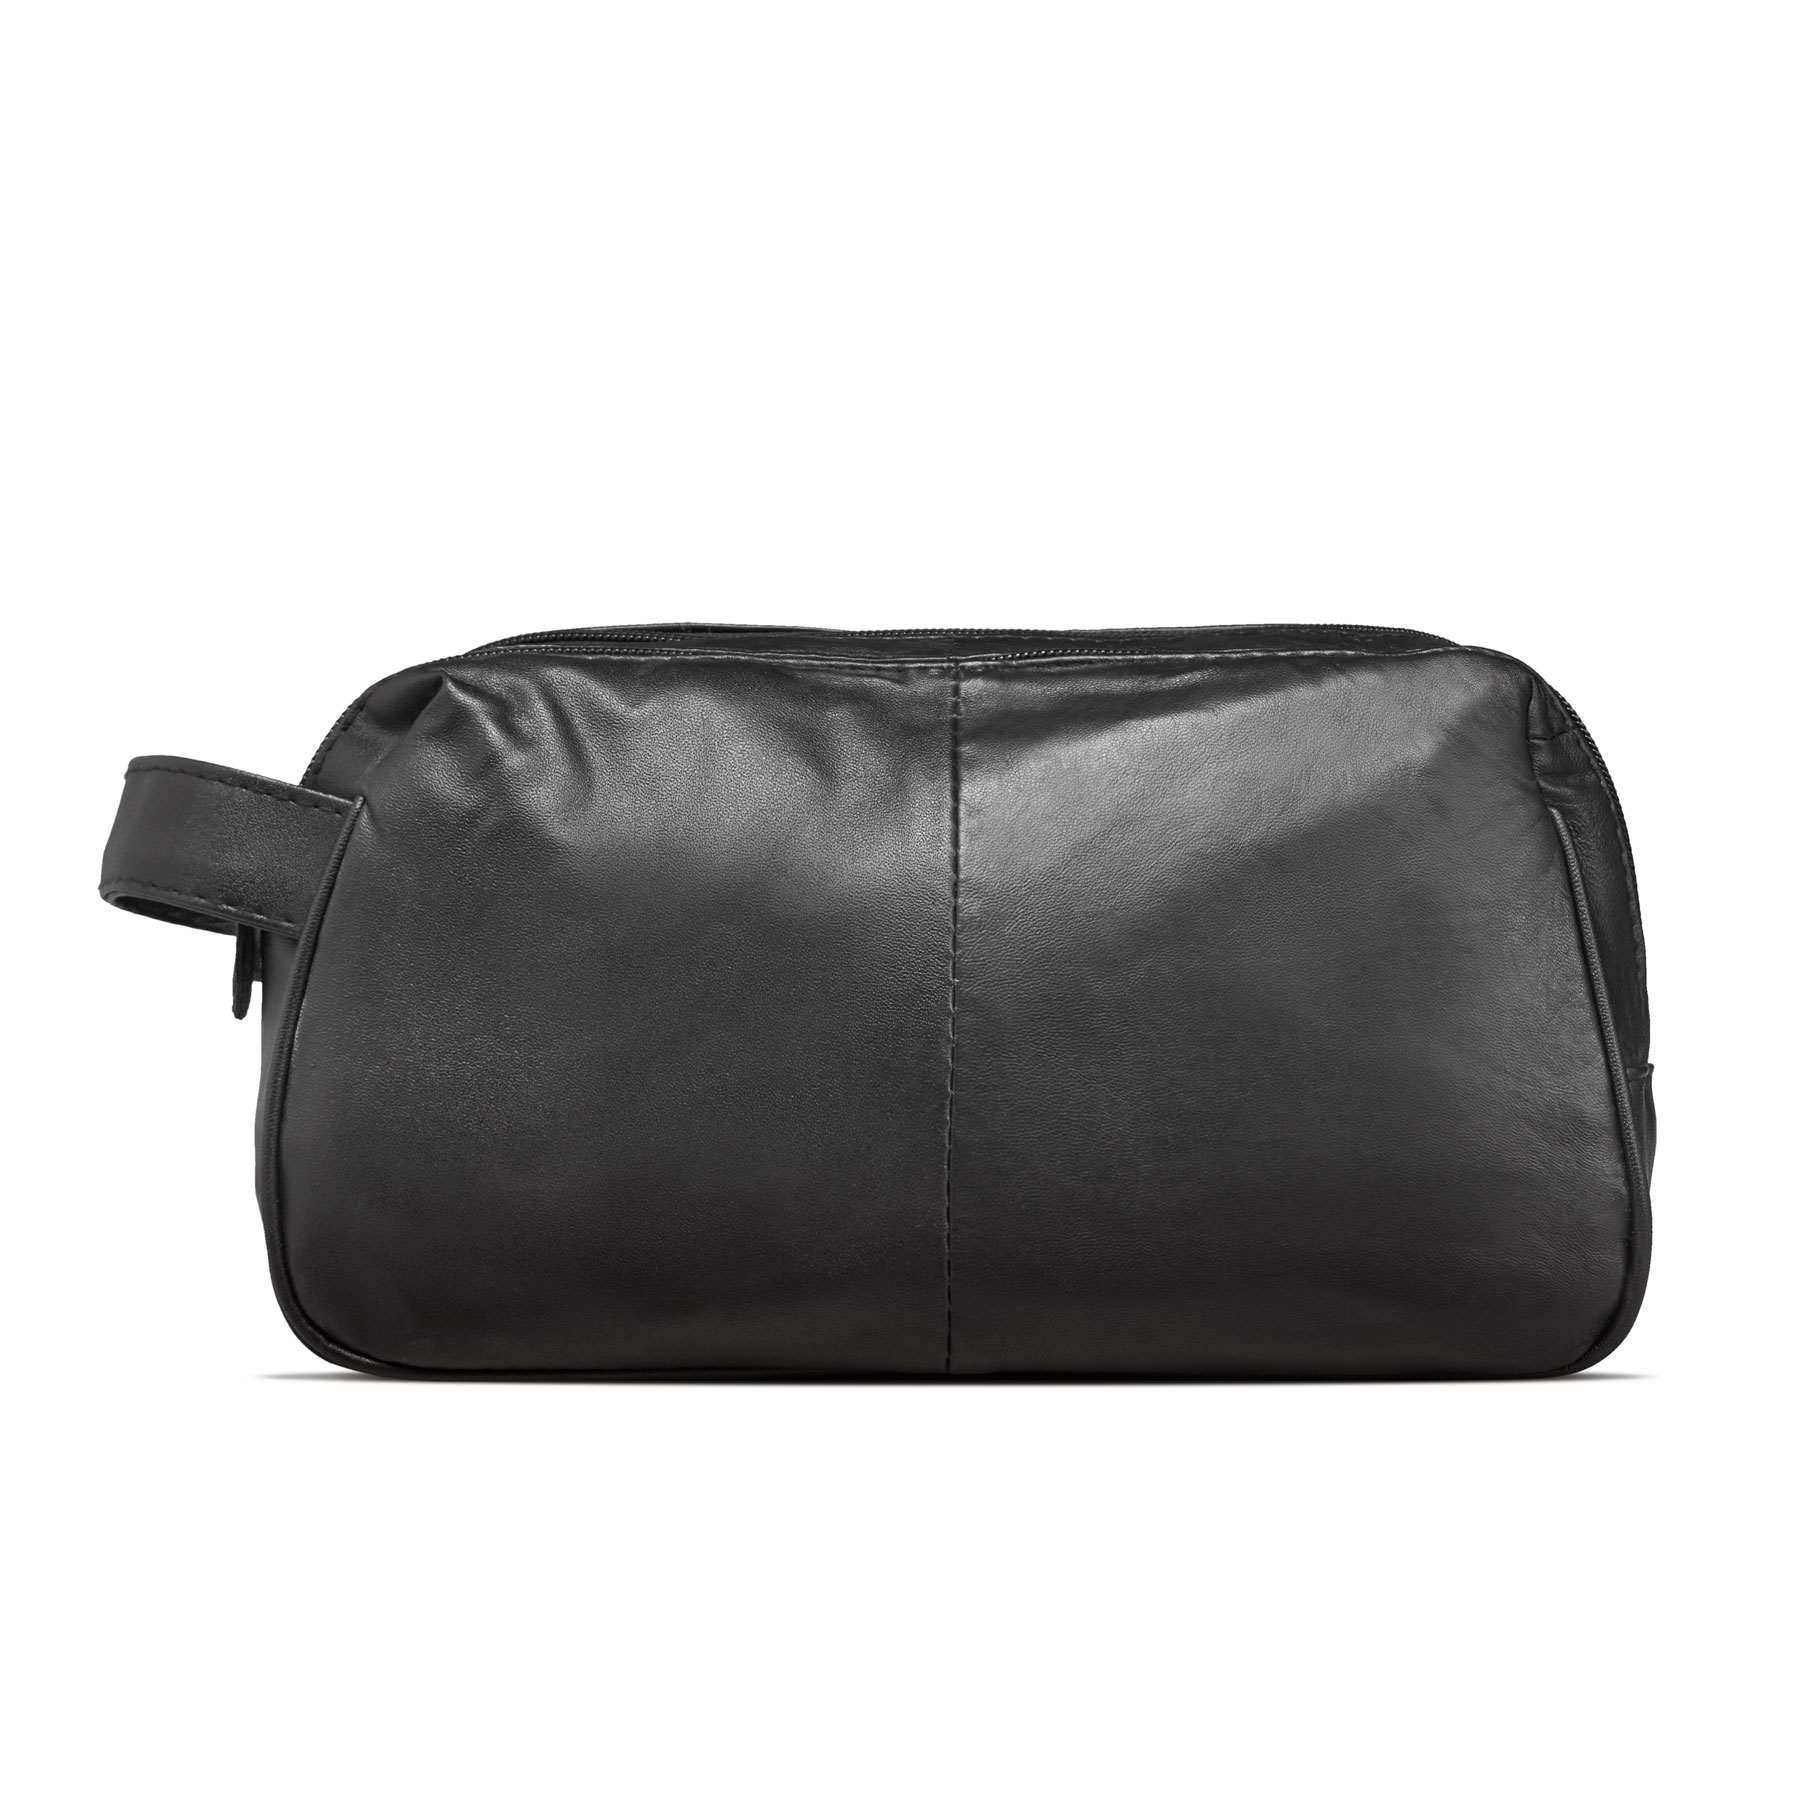 Studio - 2-Room Wash Bag For Men - Soft Lambskin